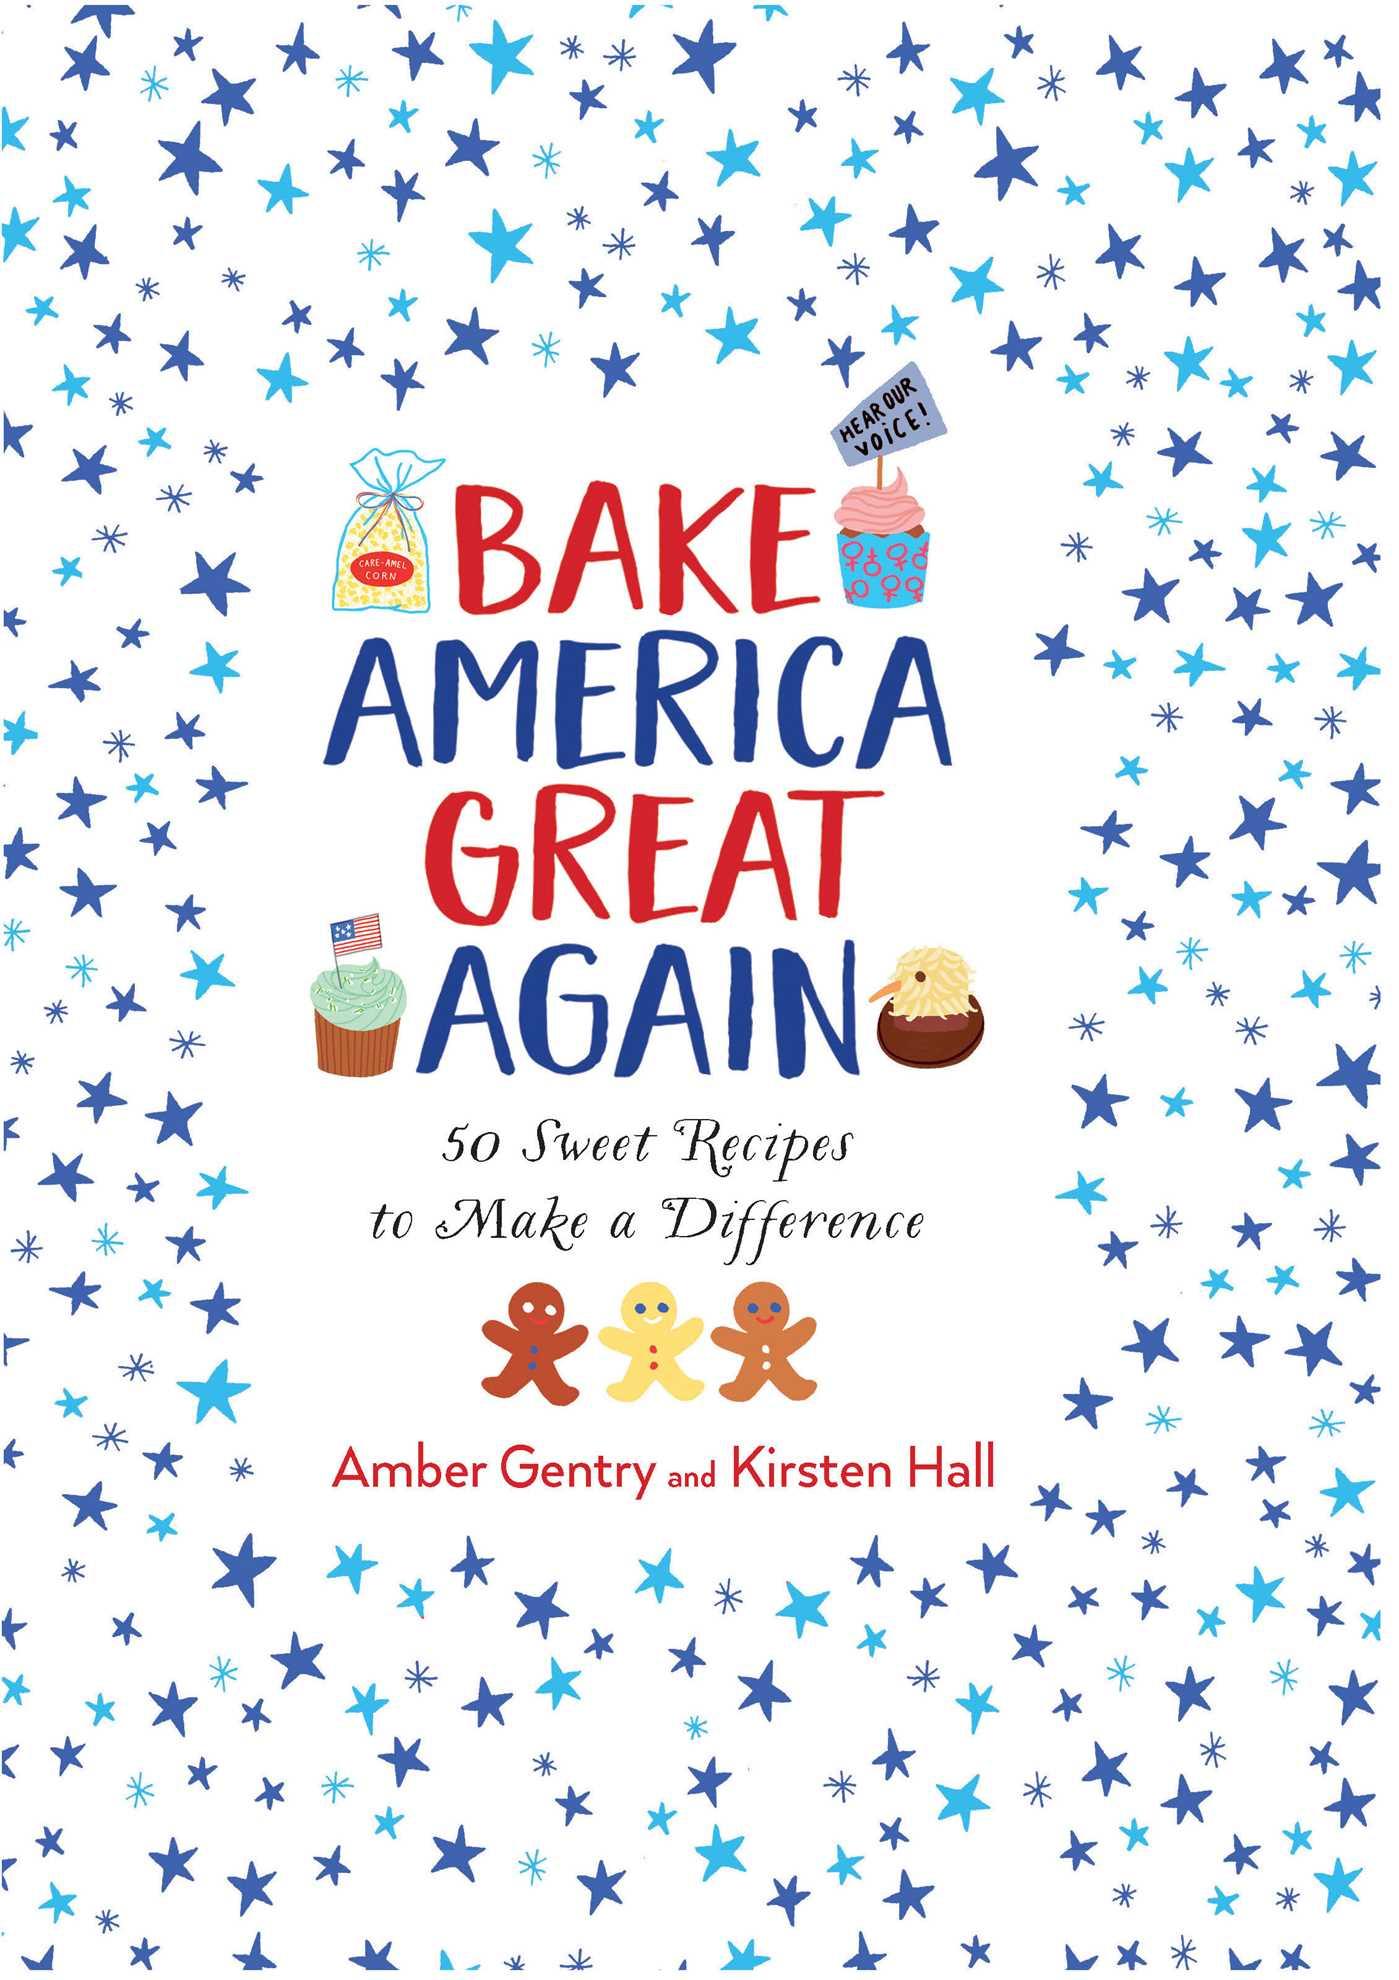 Bake america great again 9781681883212 hr